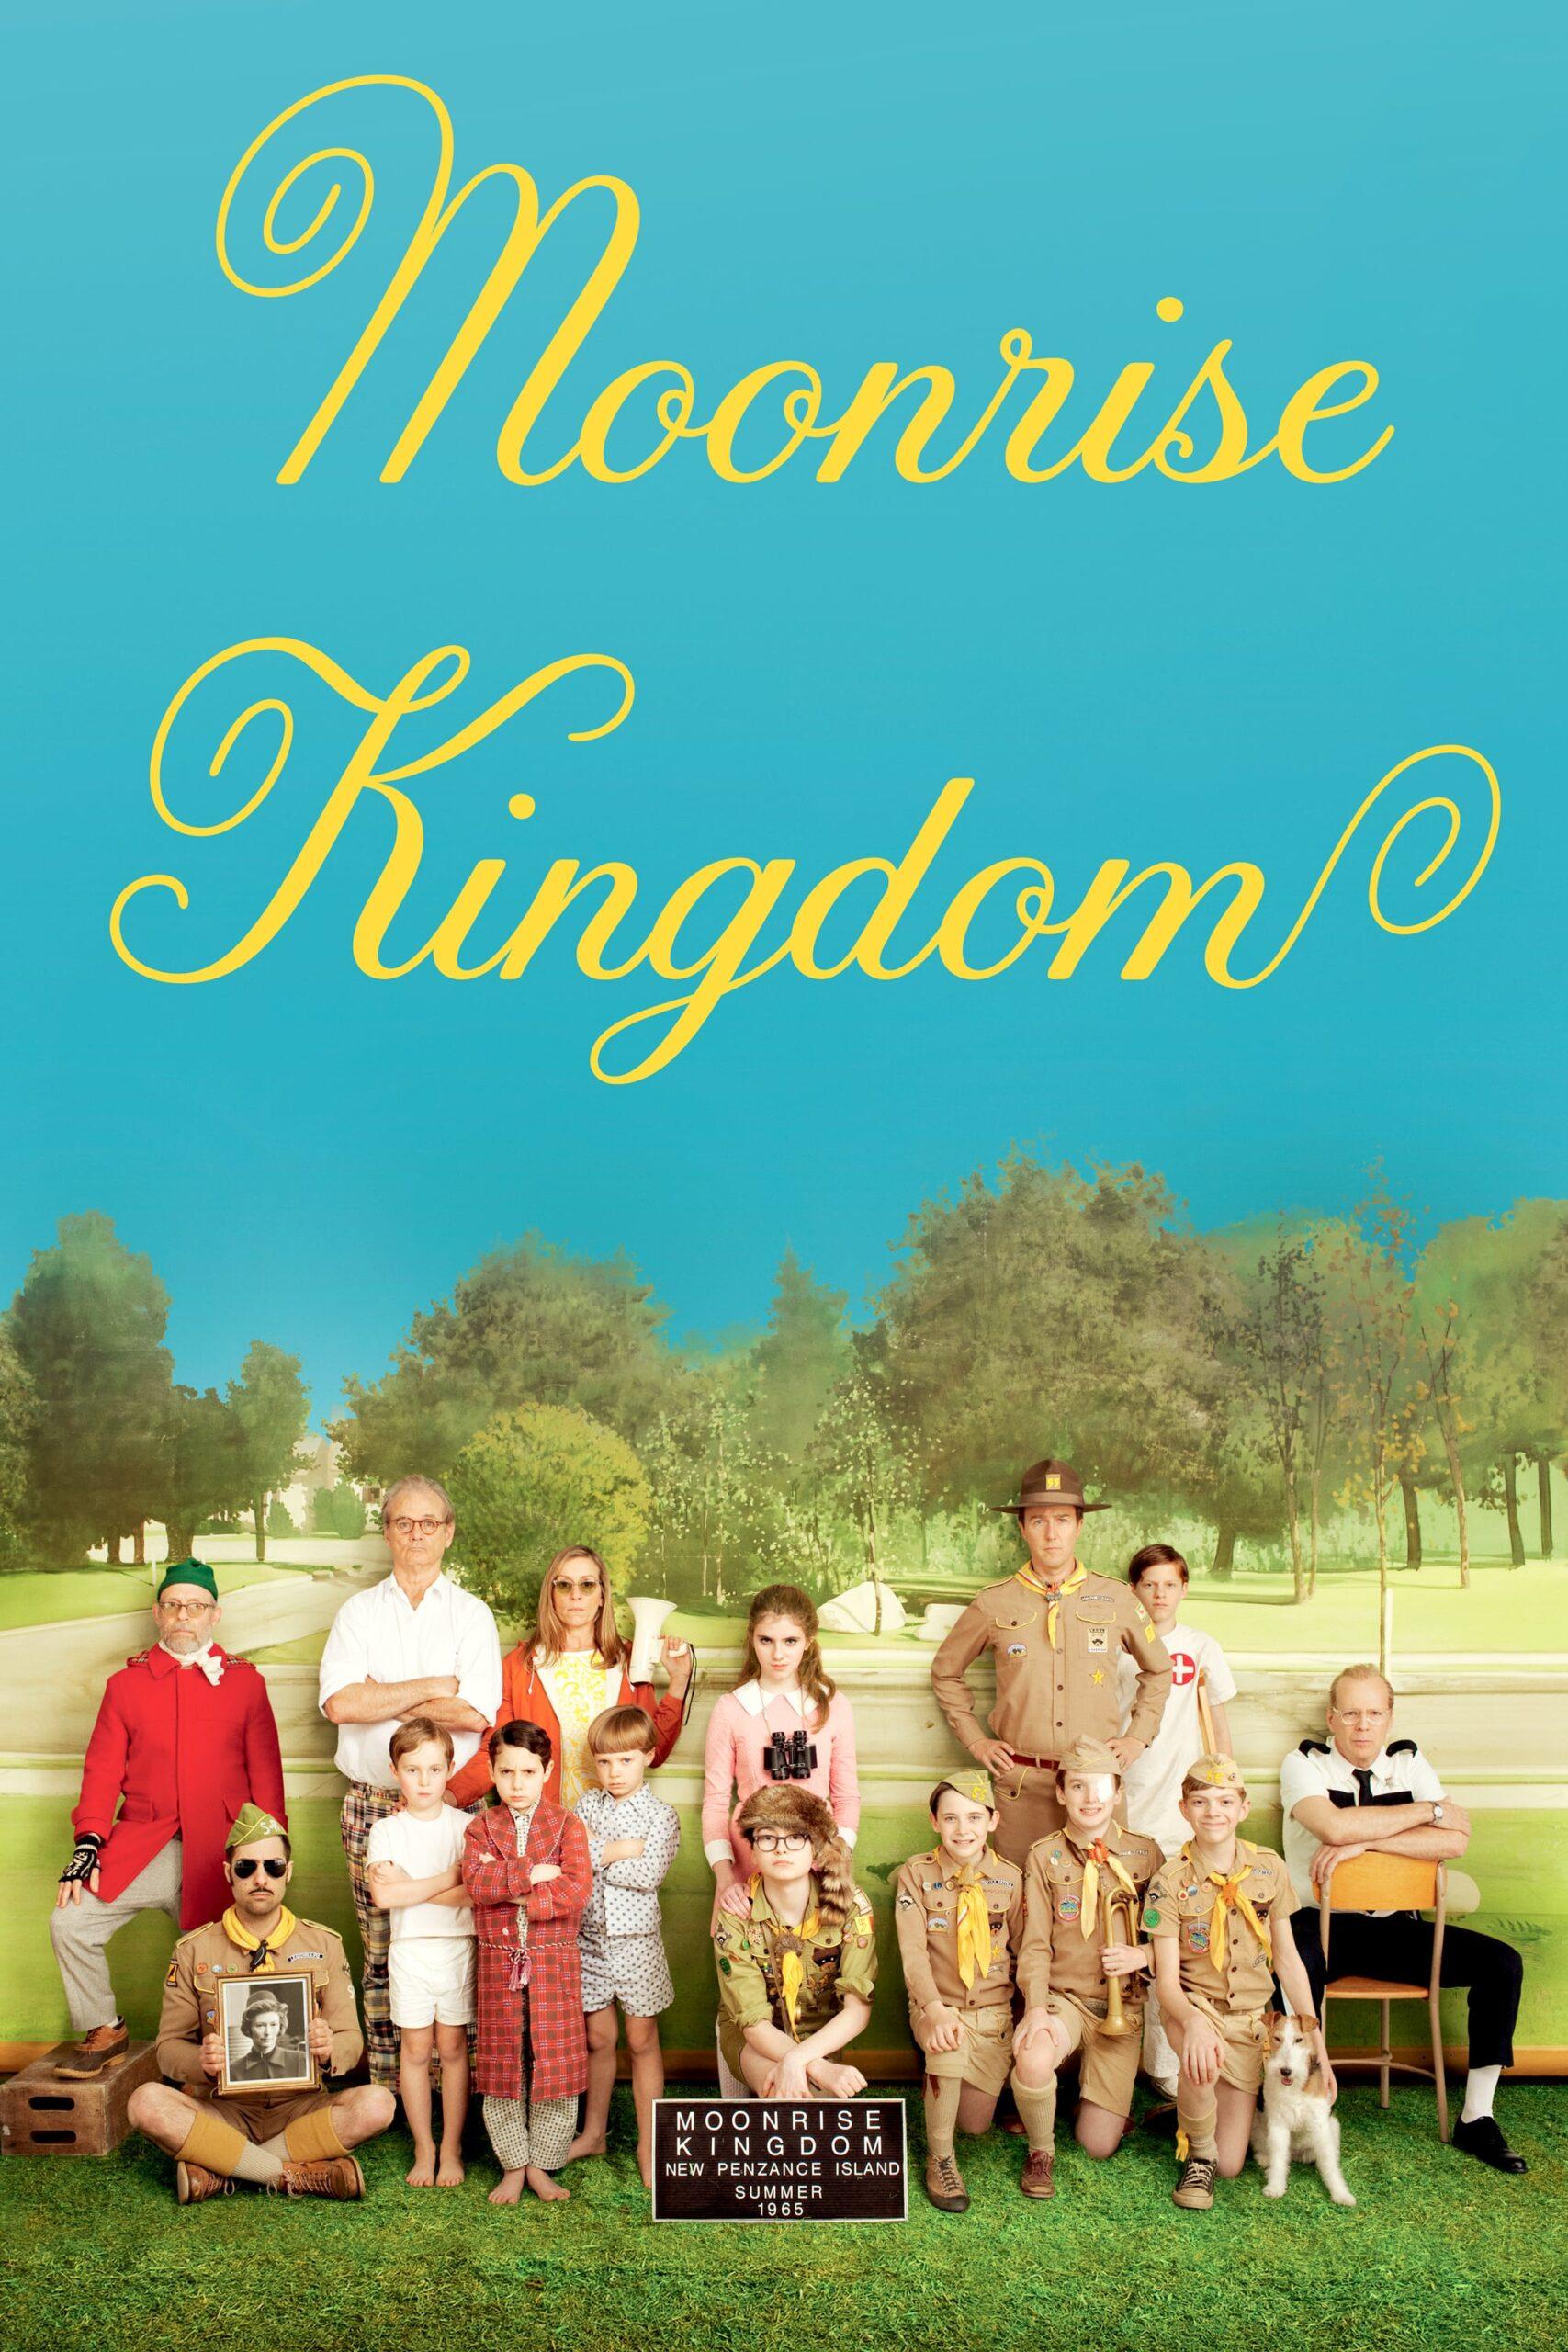 Moonrise Kingdom Movie Streaming Online Watch on Google Play, Youtube